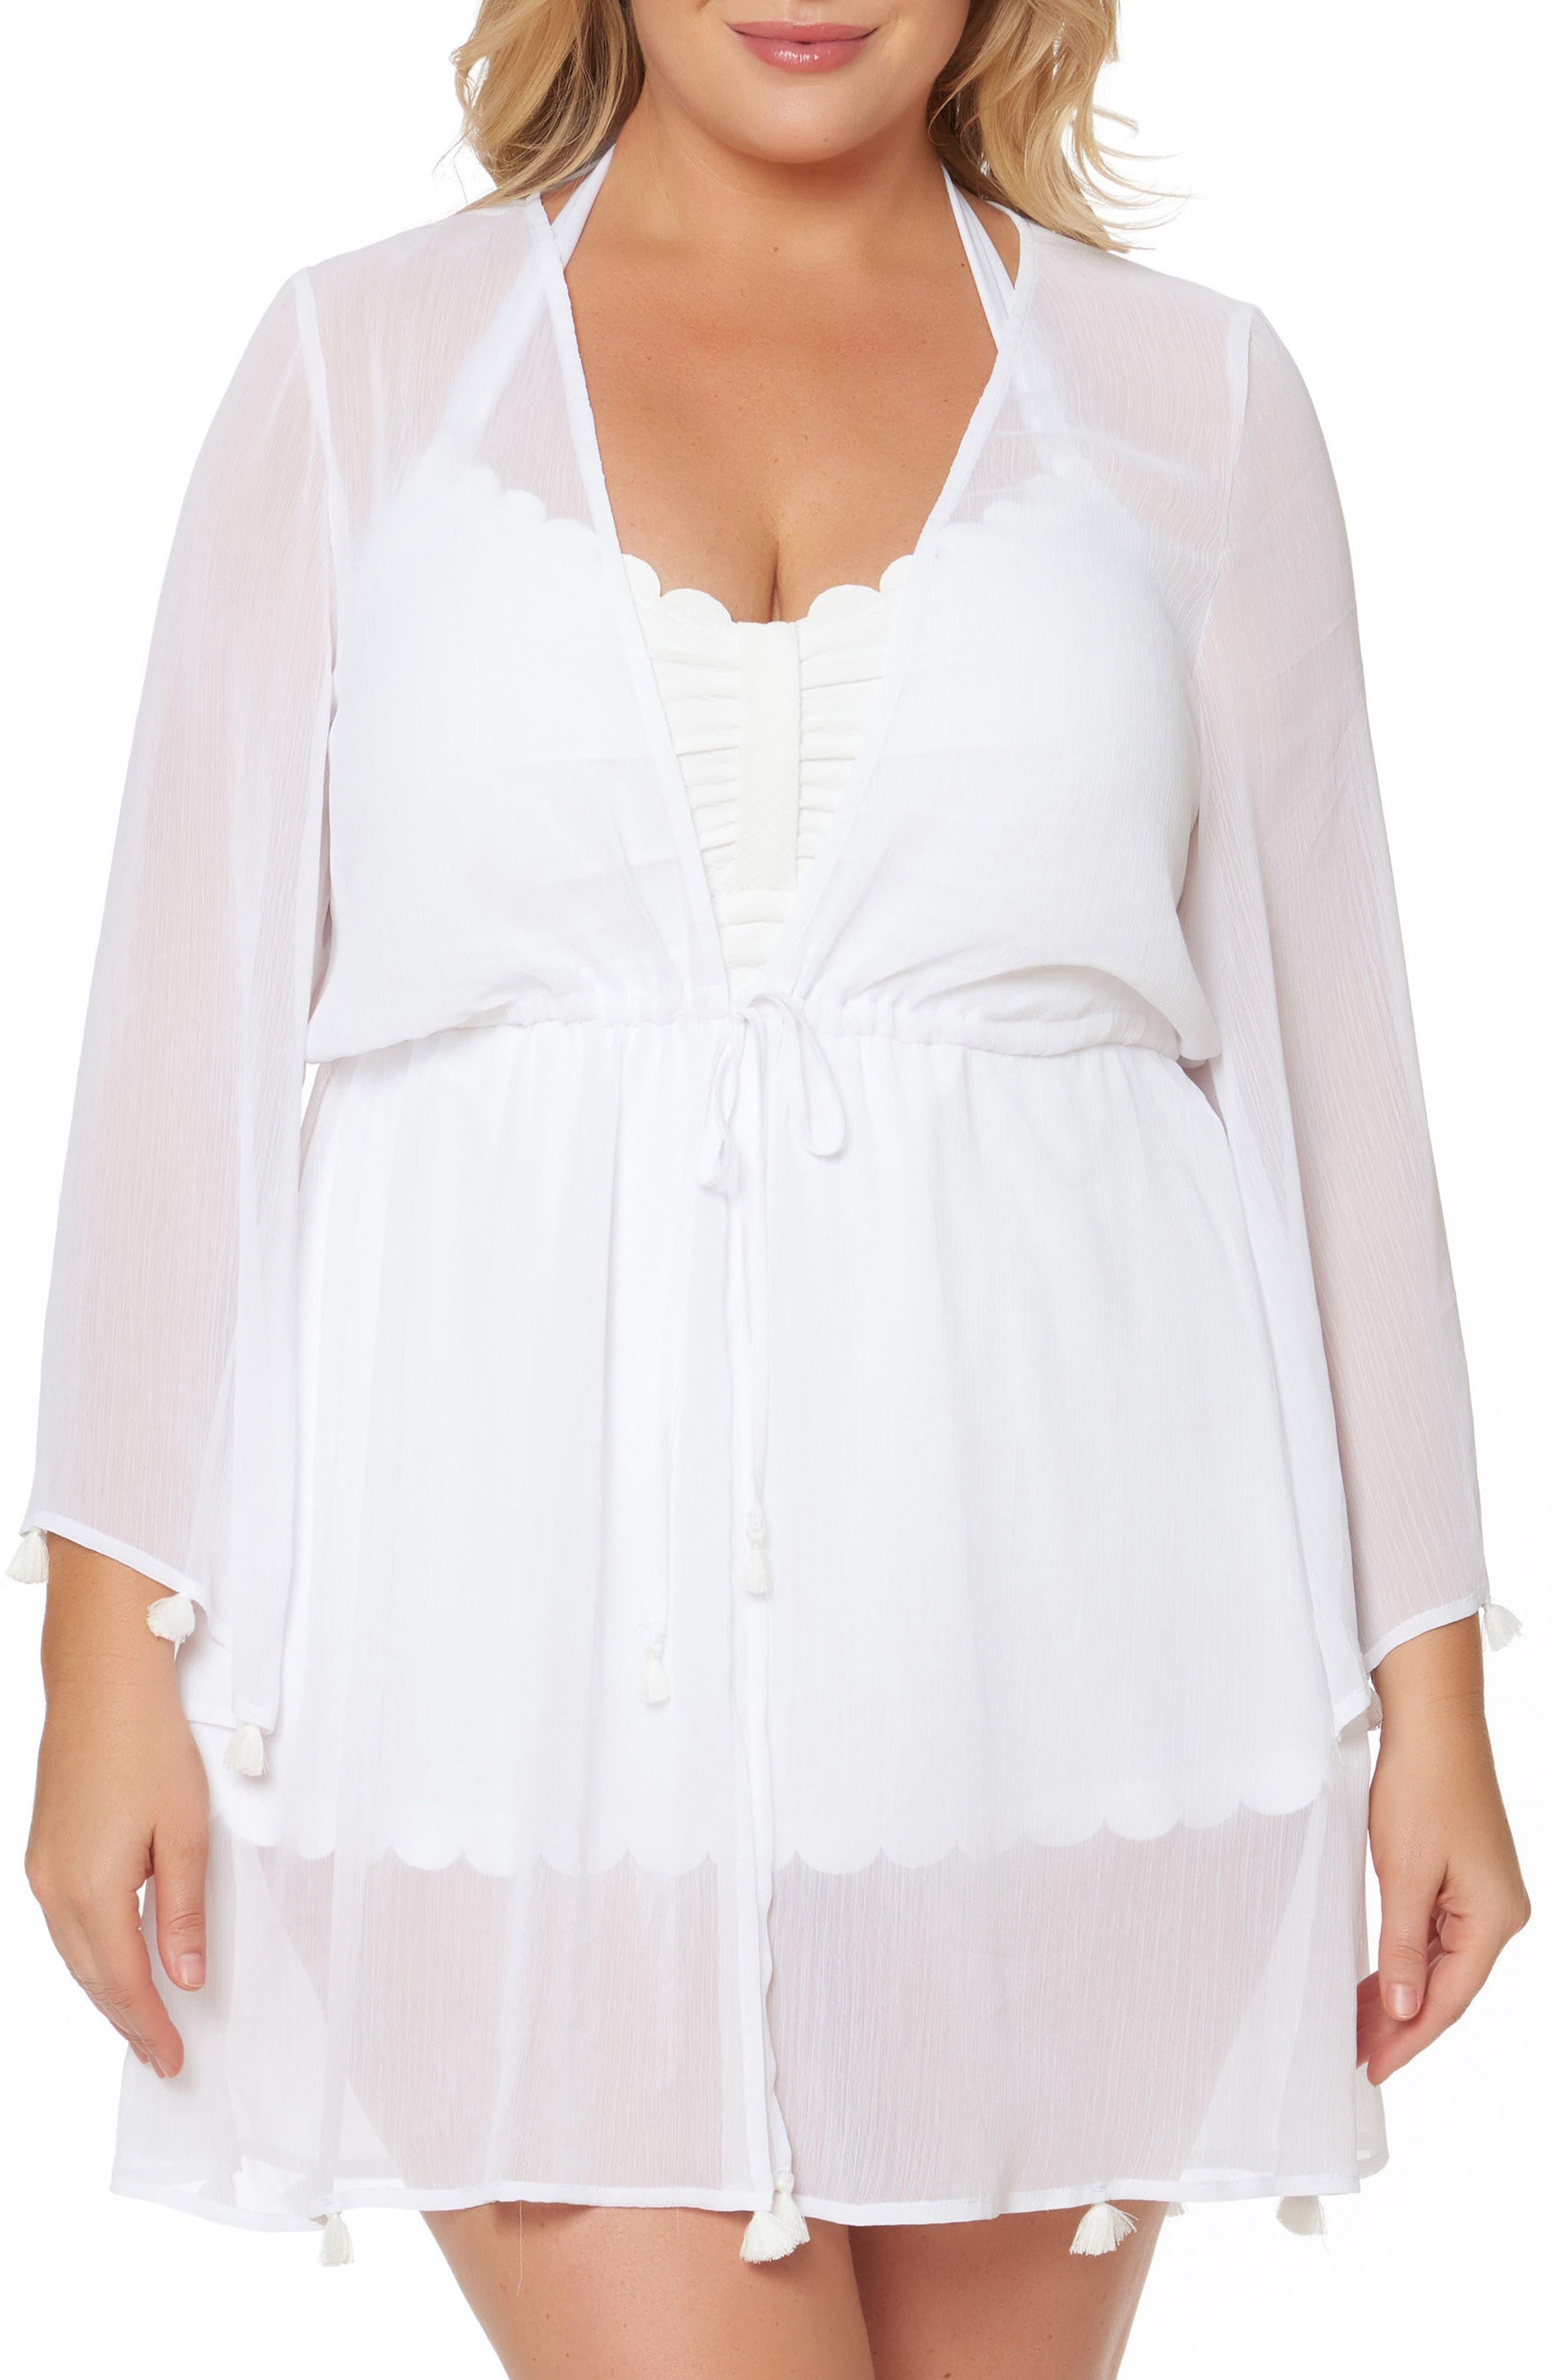 Jessica Simpson Chiffon Cover-Up Kimono (Plus Size)